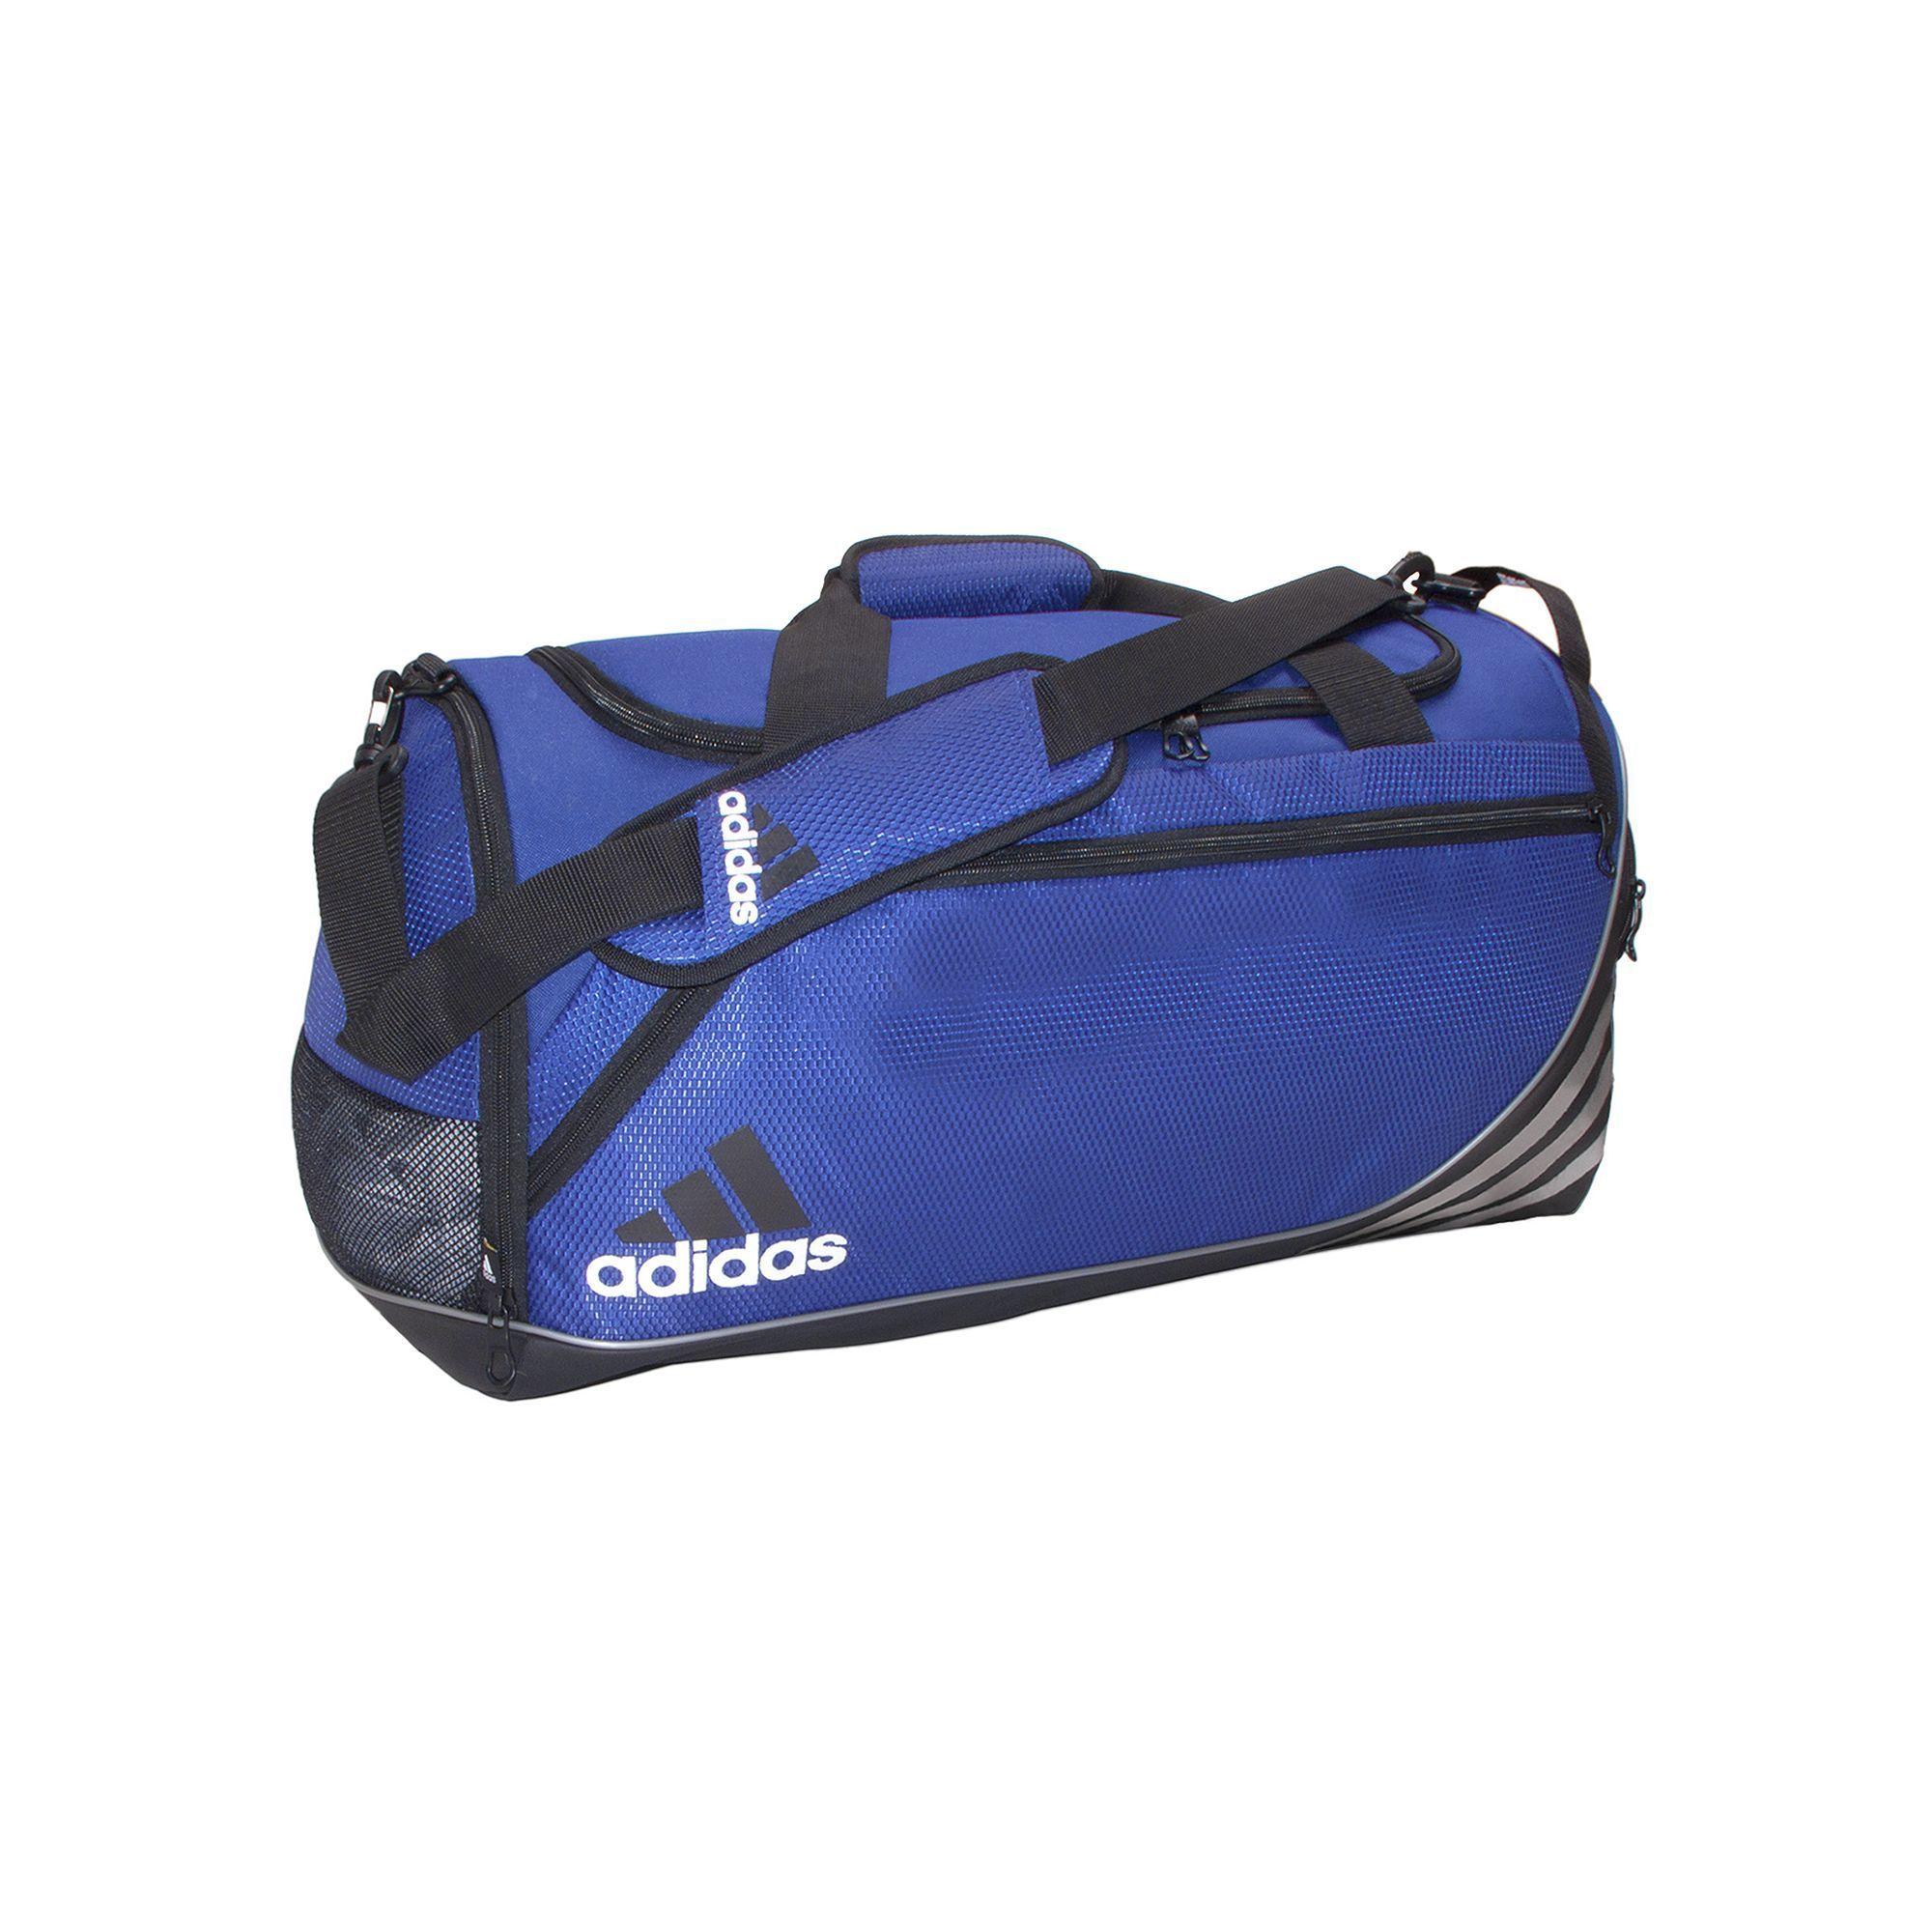 59687cd3e2 adidas Team Speed Medium Duffel Bag